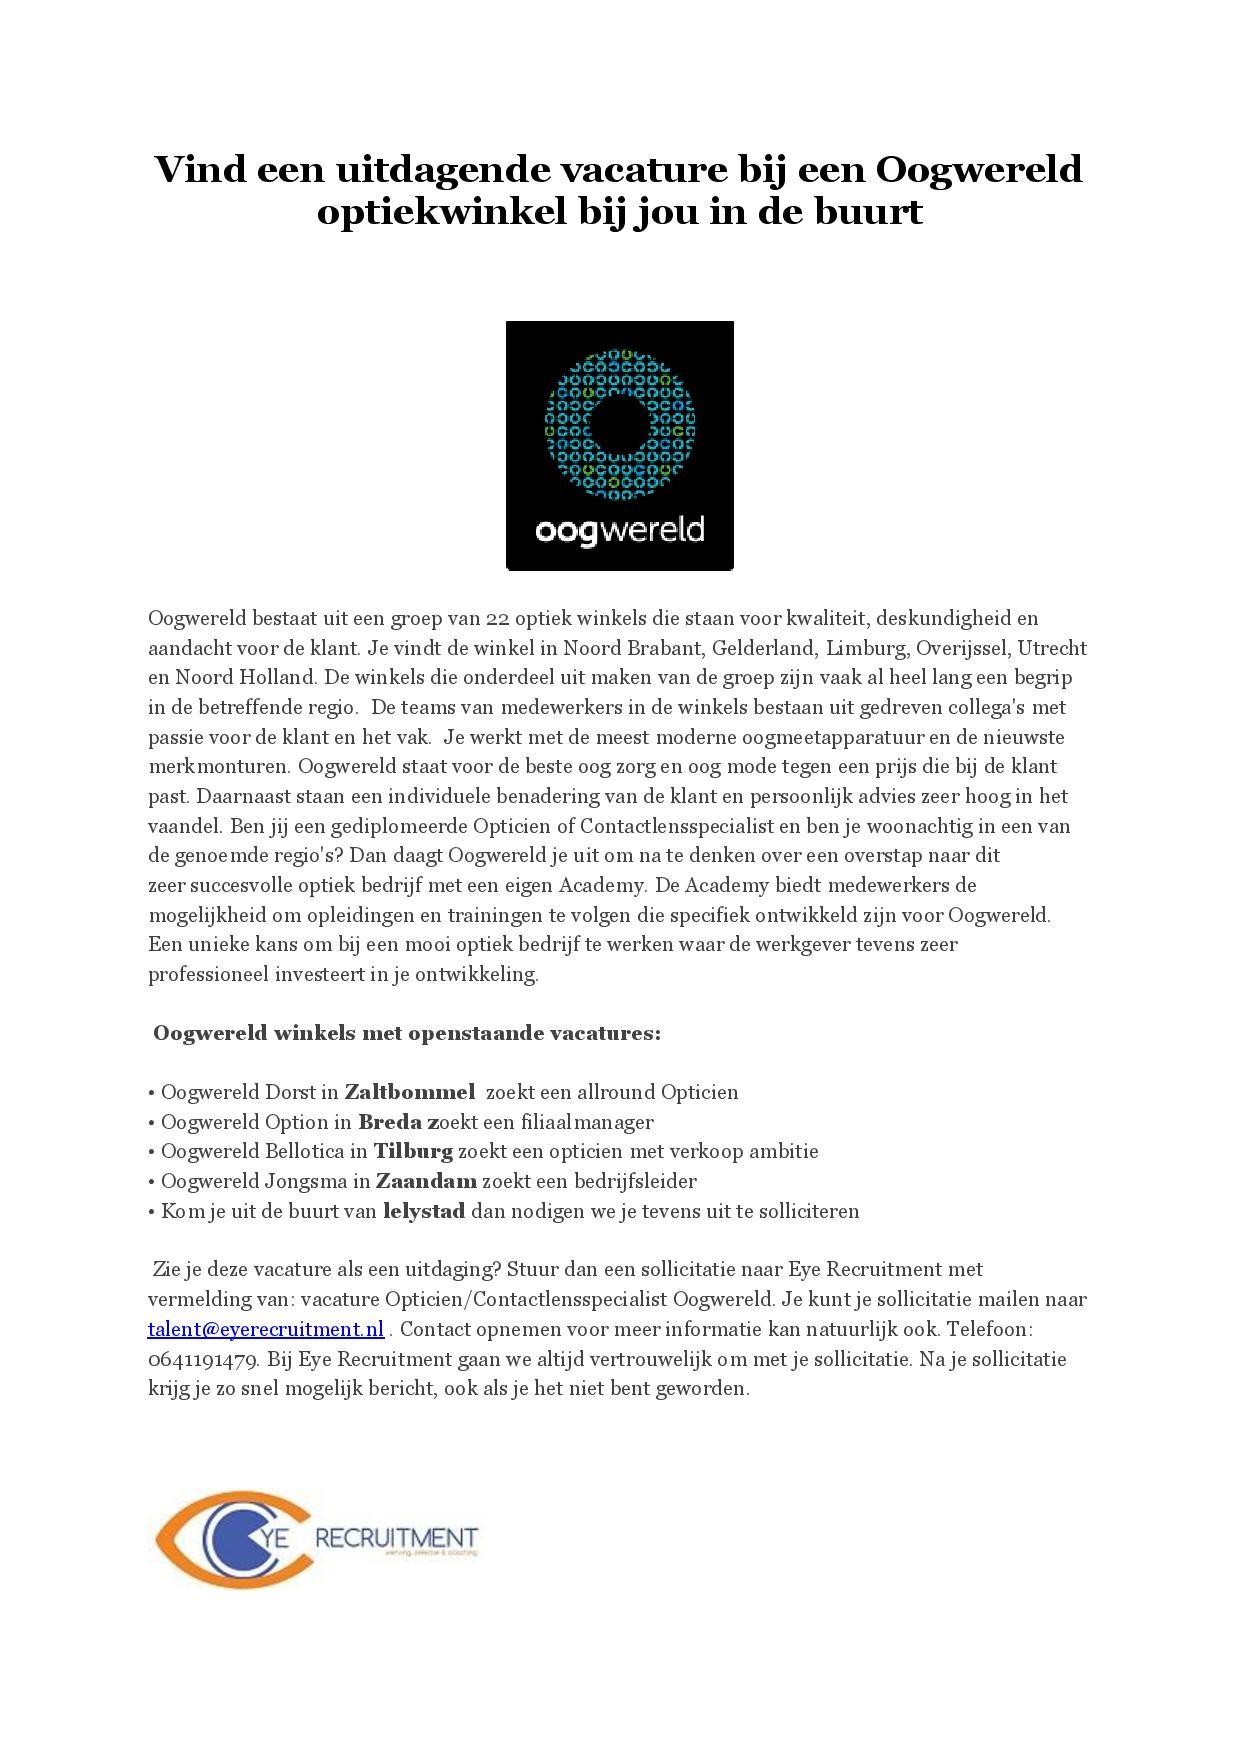 advertentie Oogwereld vacatures nov 2014-page-001 (4)